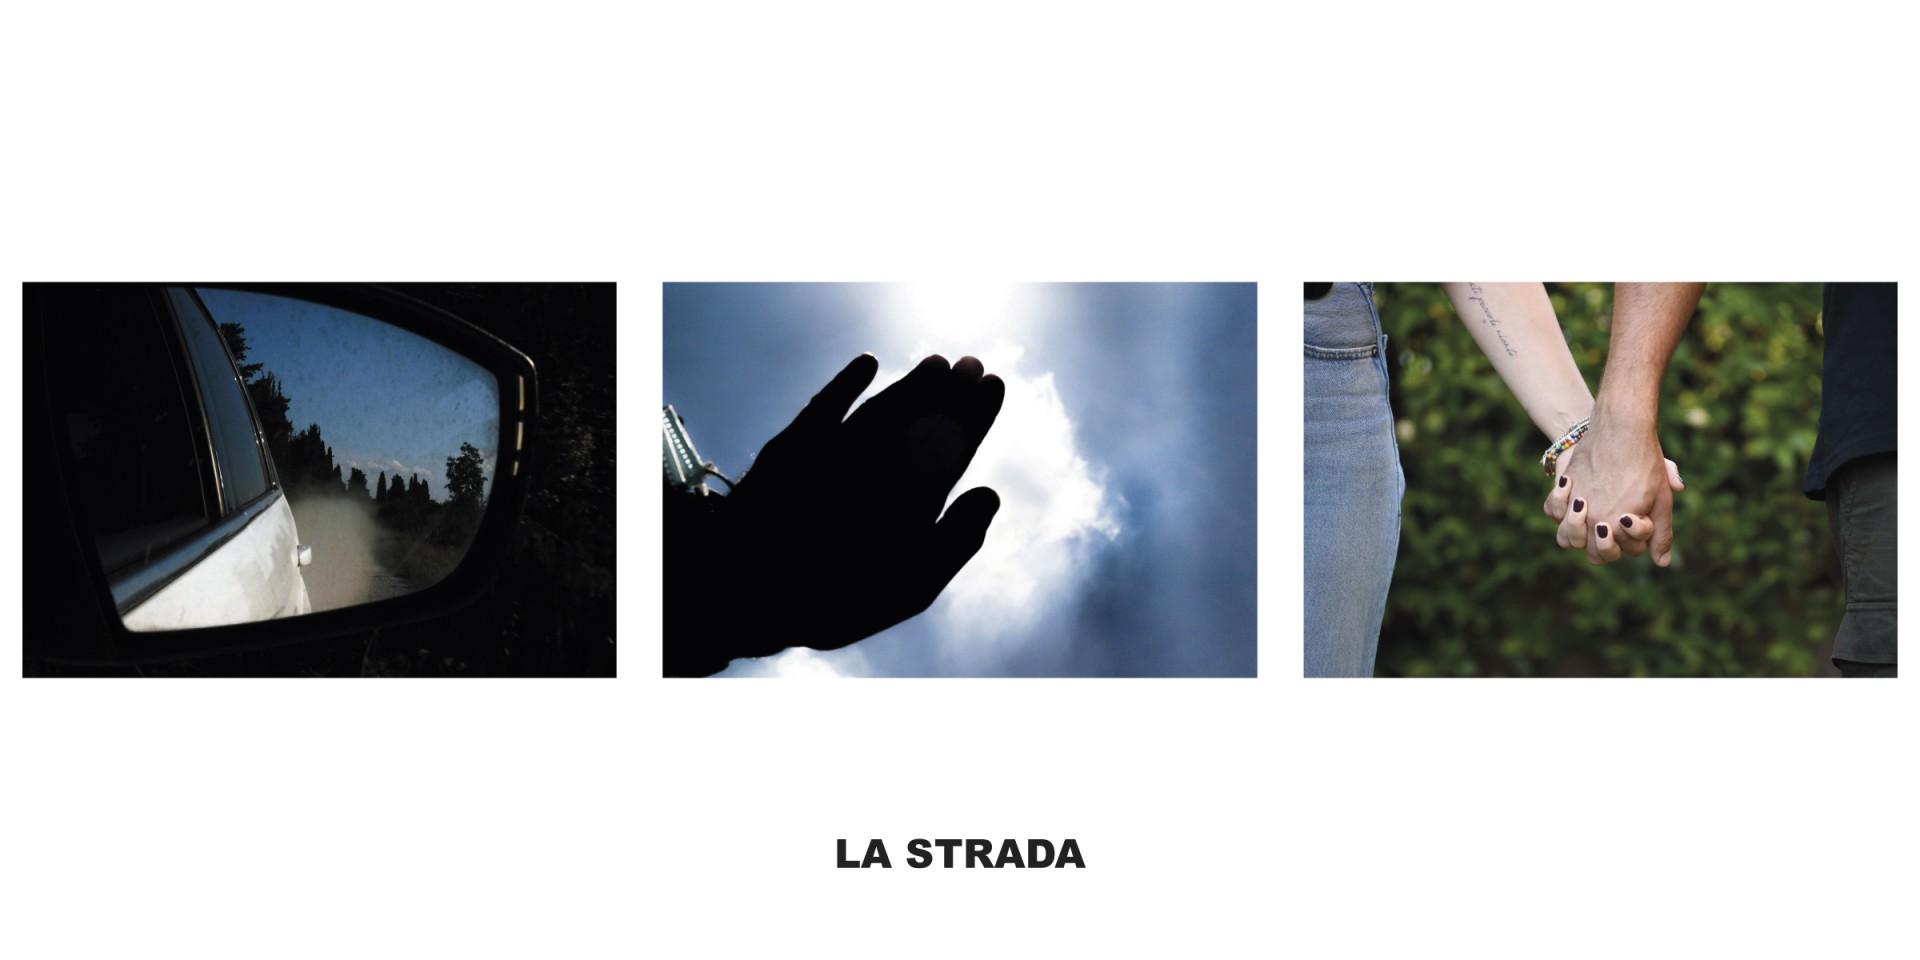 01-slide-la-strada-1.jpg